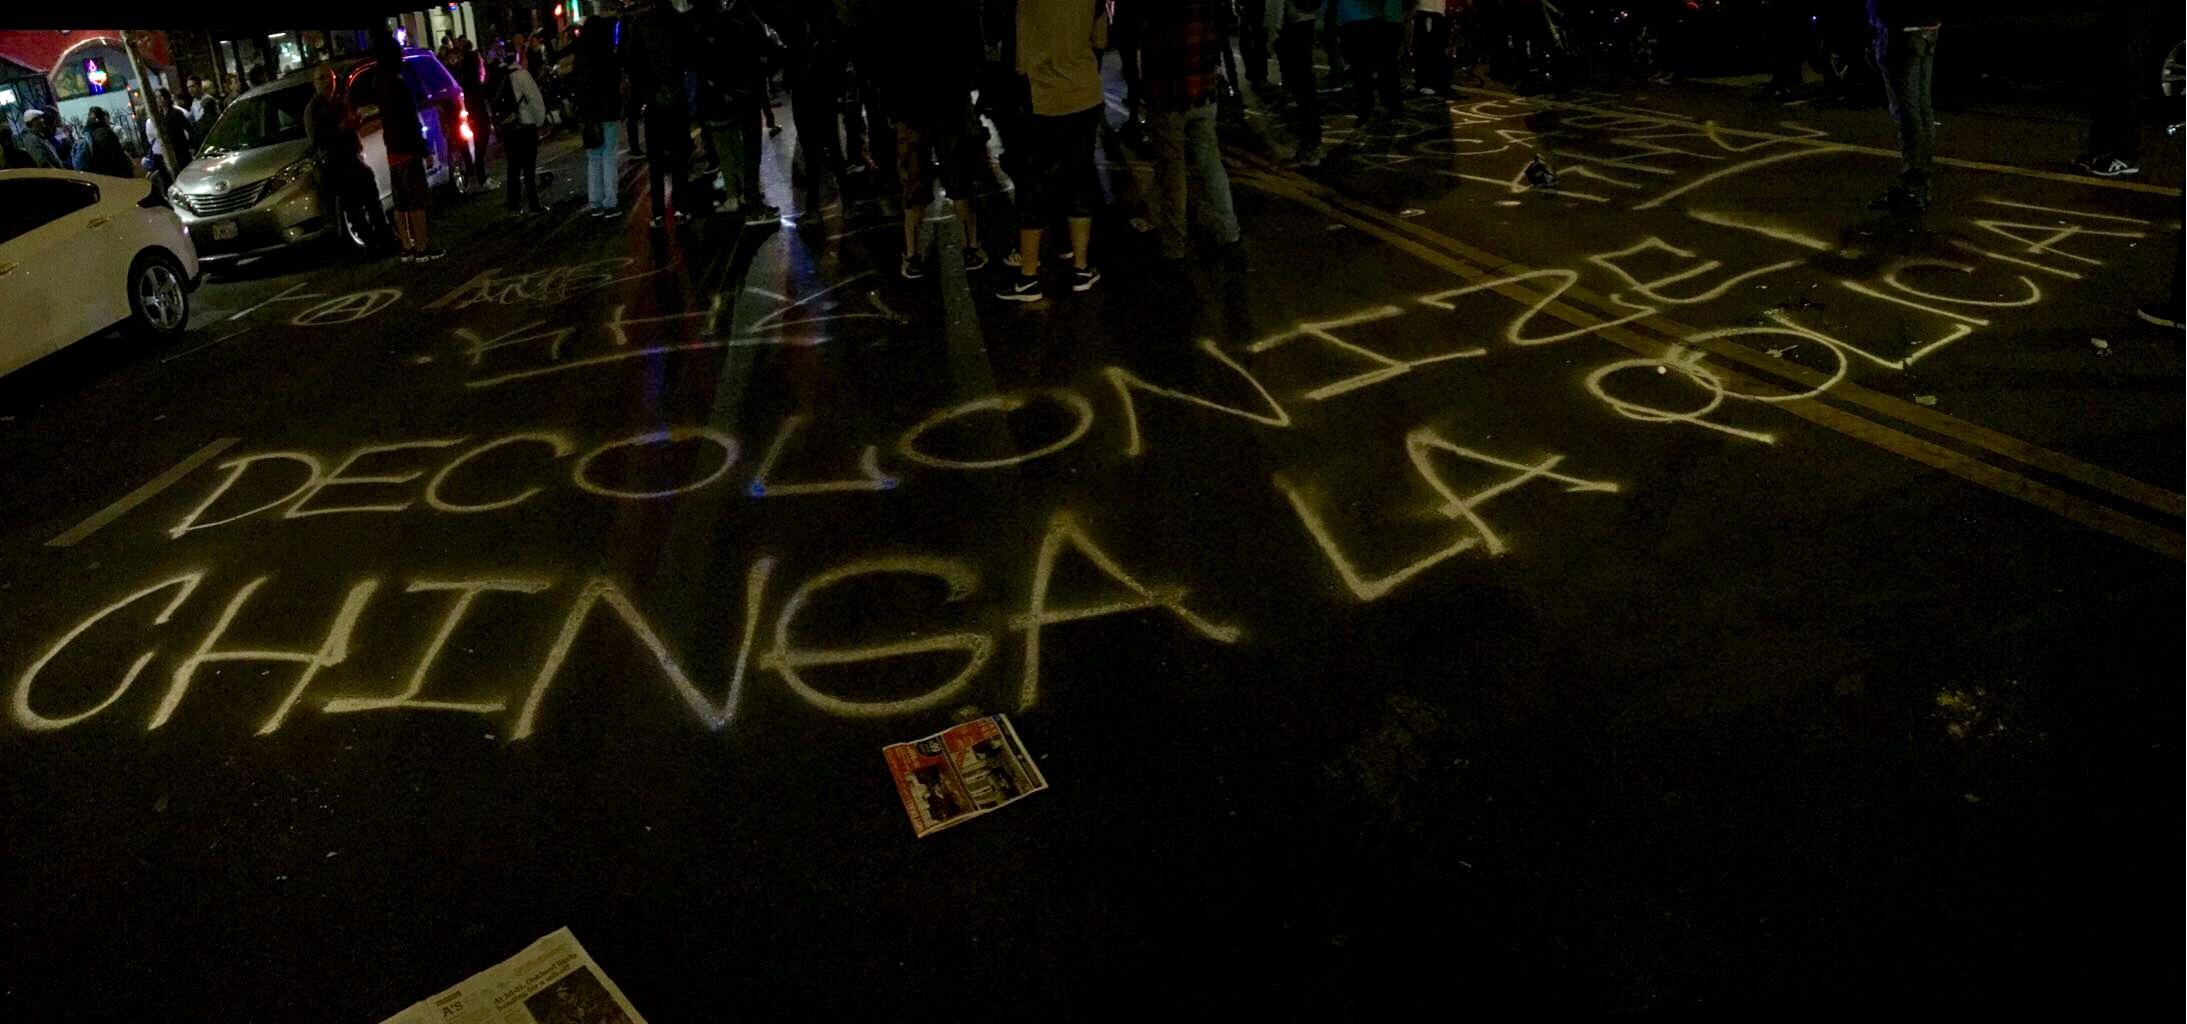 decolonize-chinga-policia-graffiti-sf